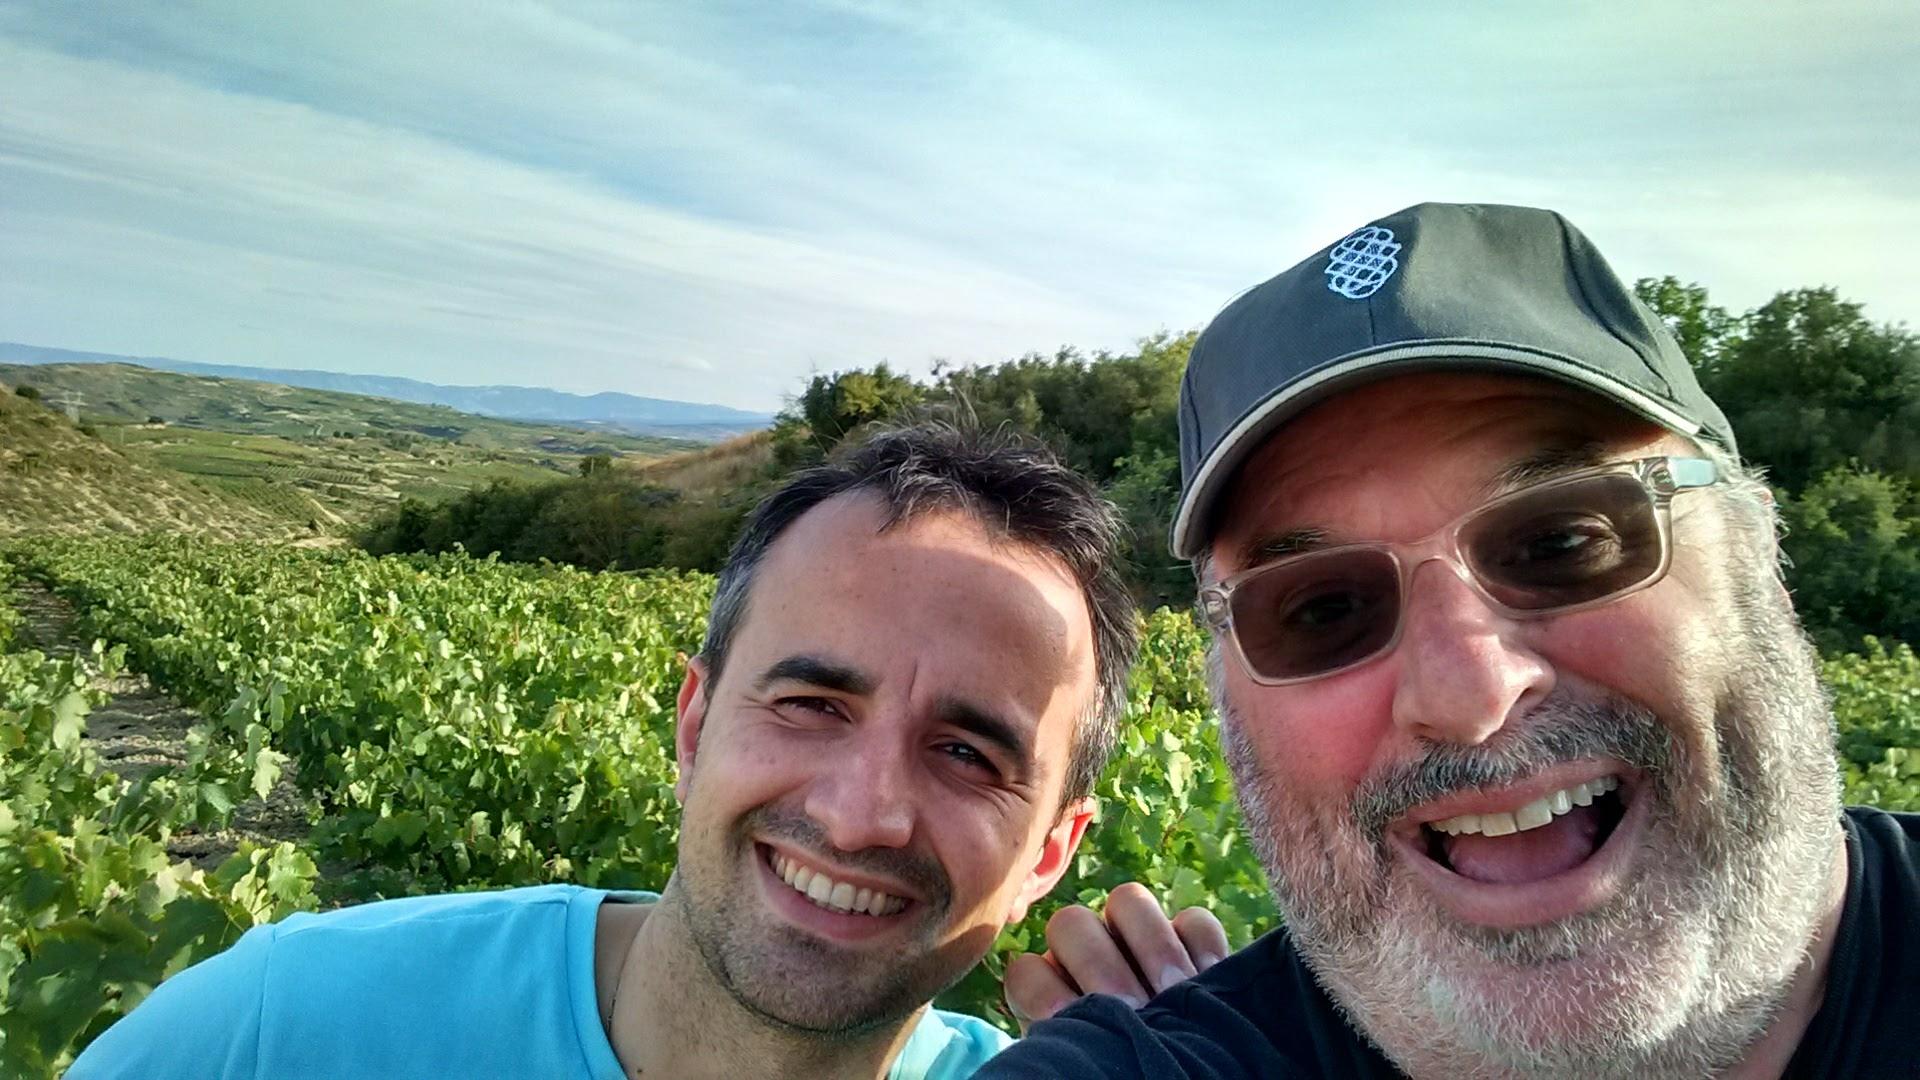 Jose and PFA host Chris Angelus in La Rioja